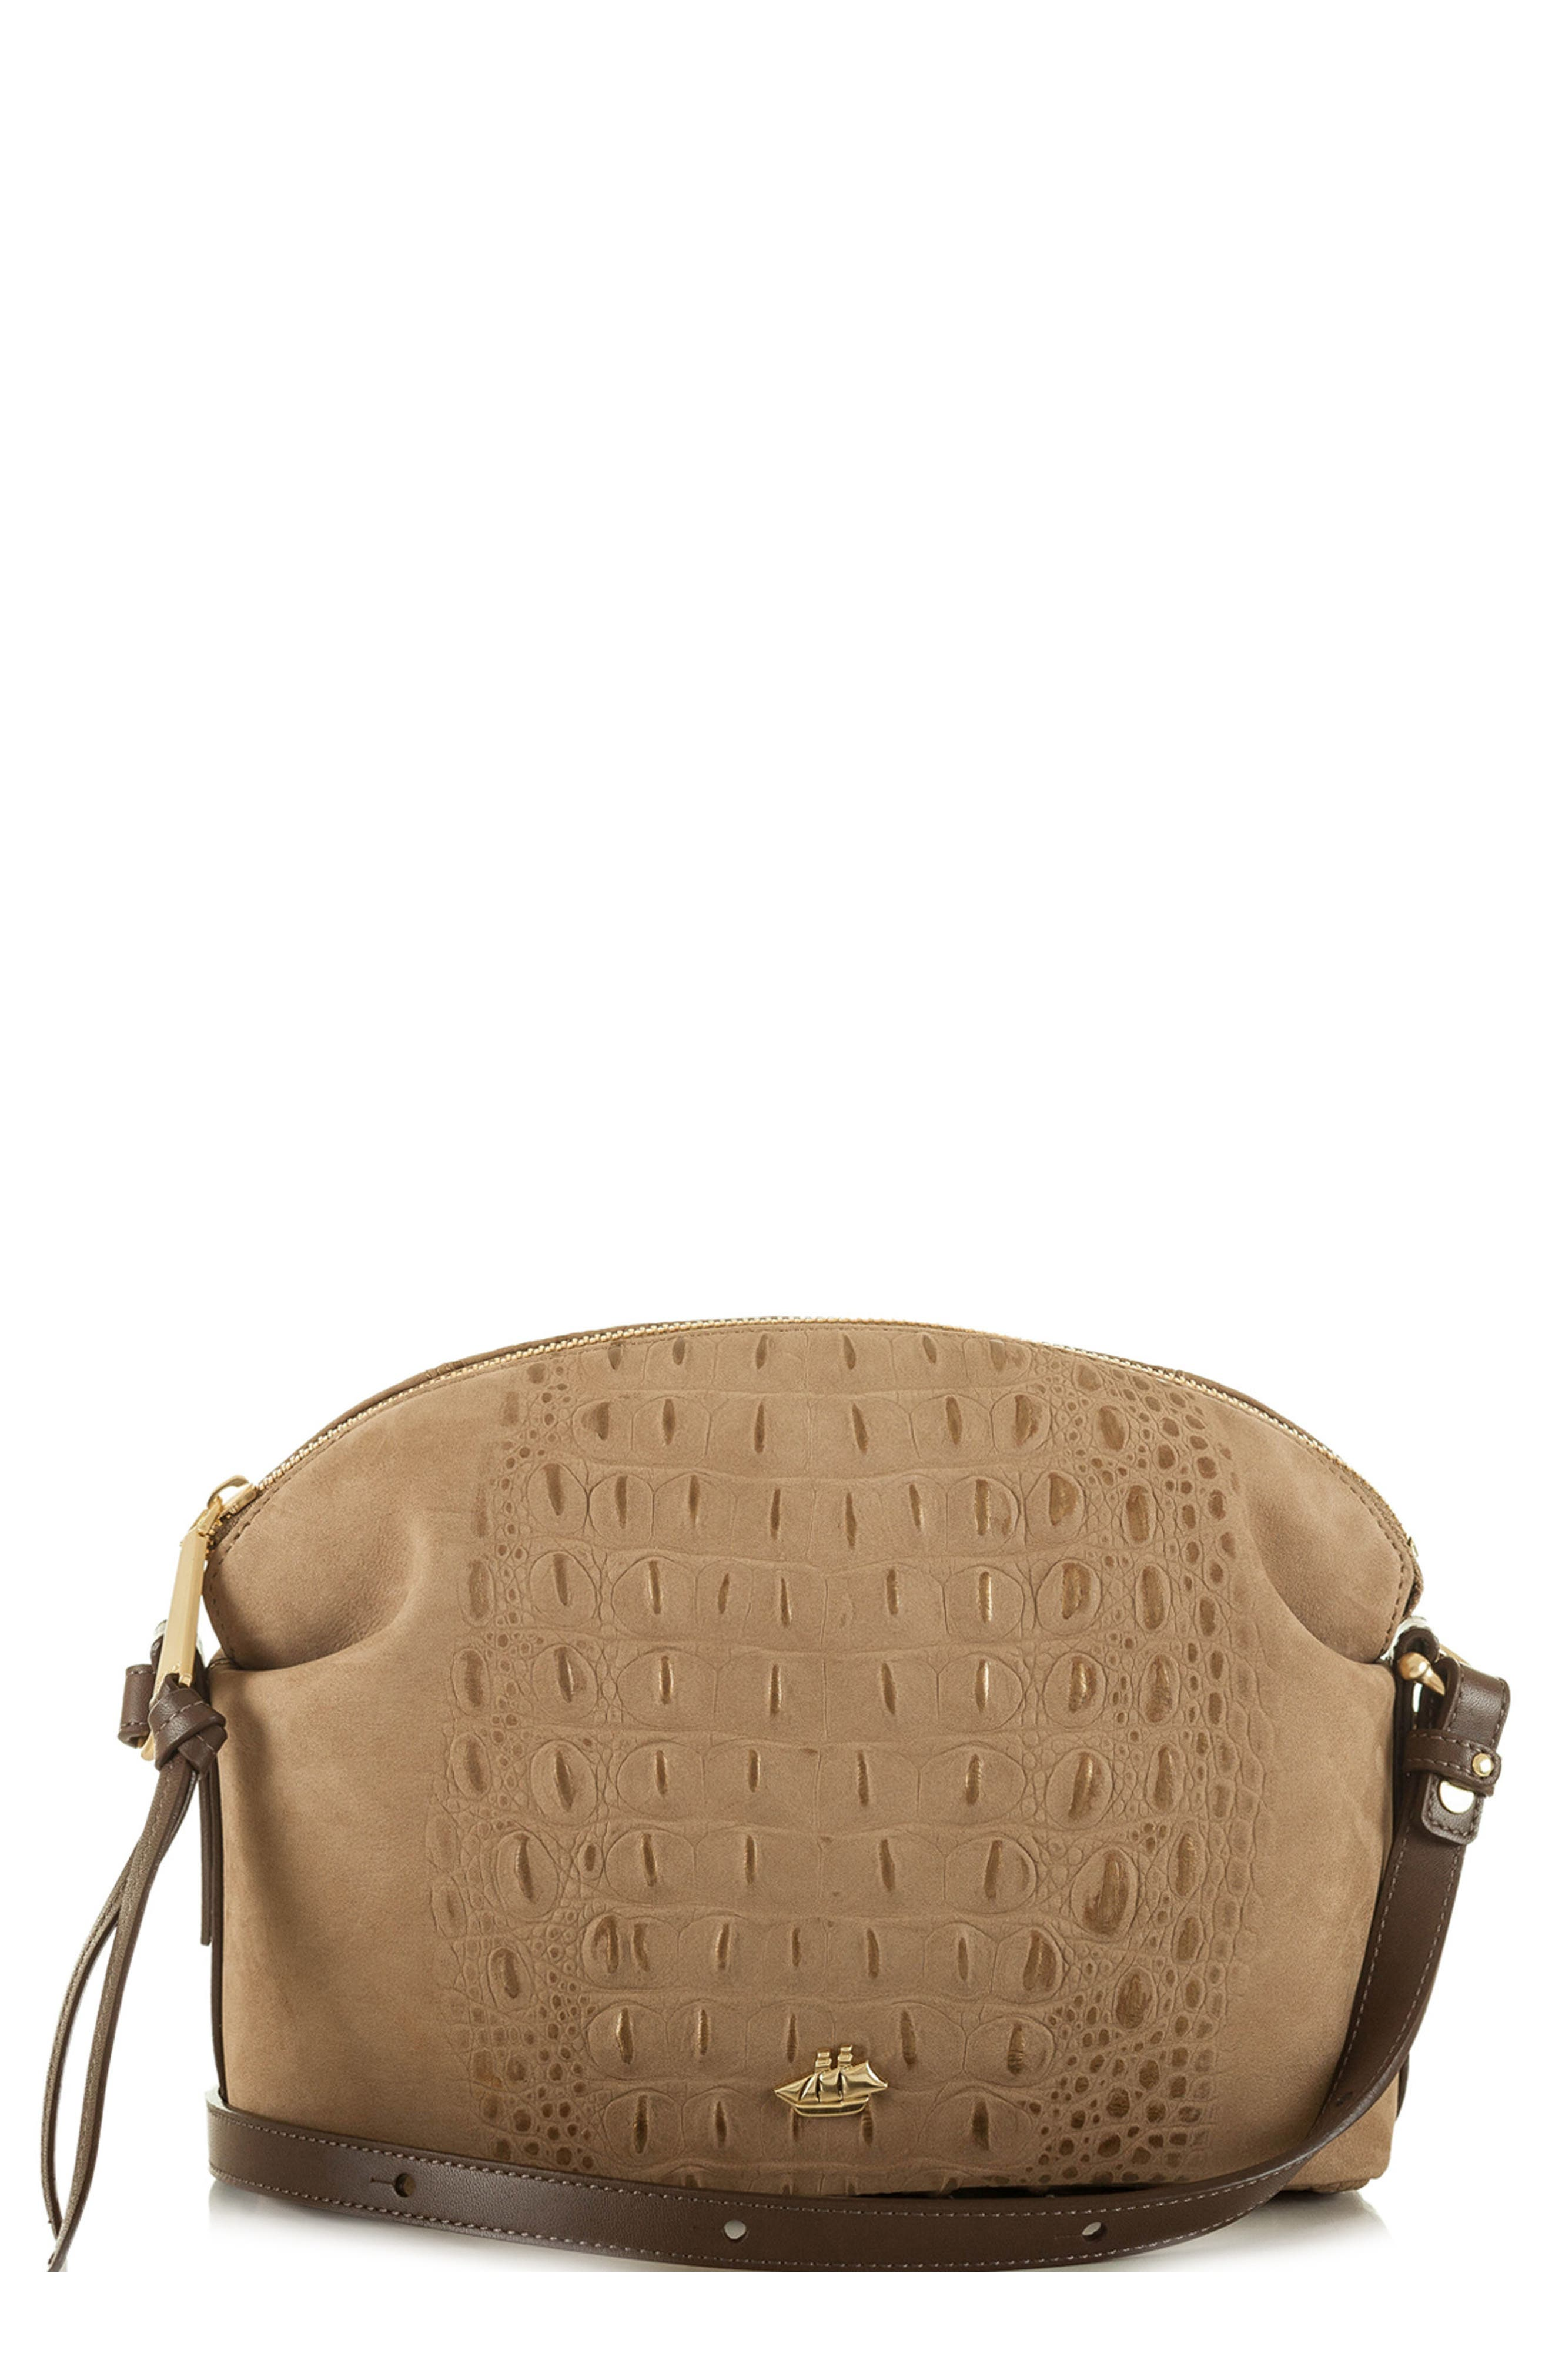 Brahmin Southcast Haley Metallic Croc Embossed Leather Crossbody Bag